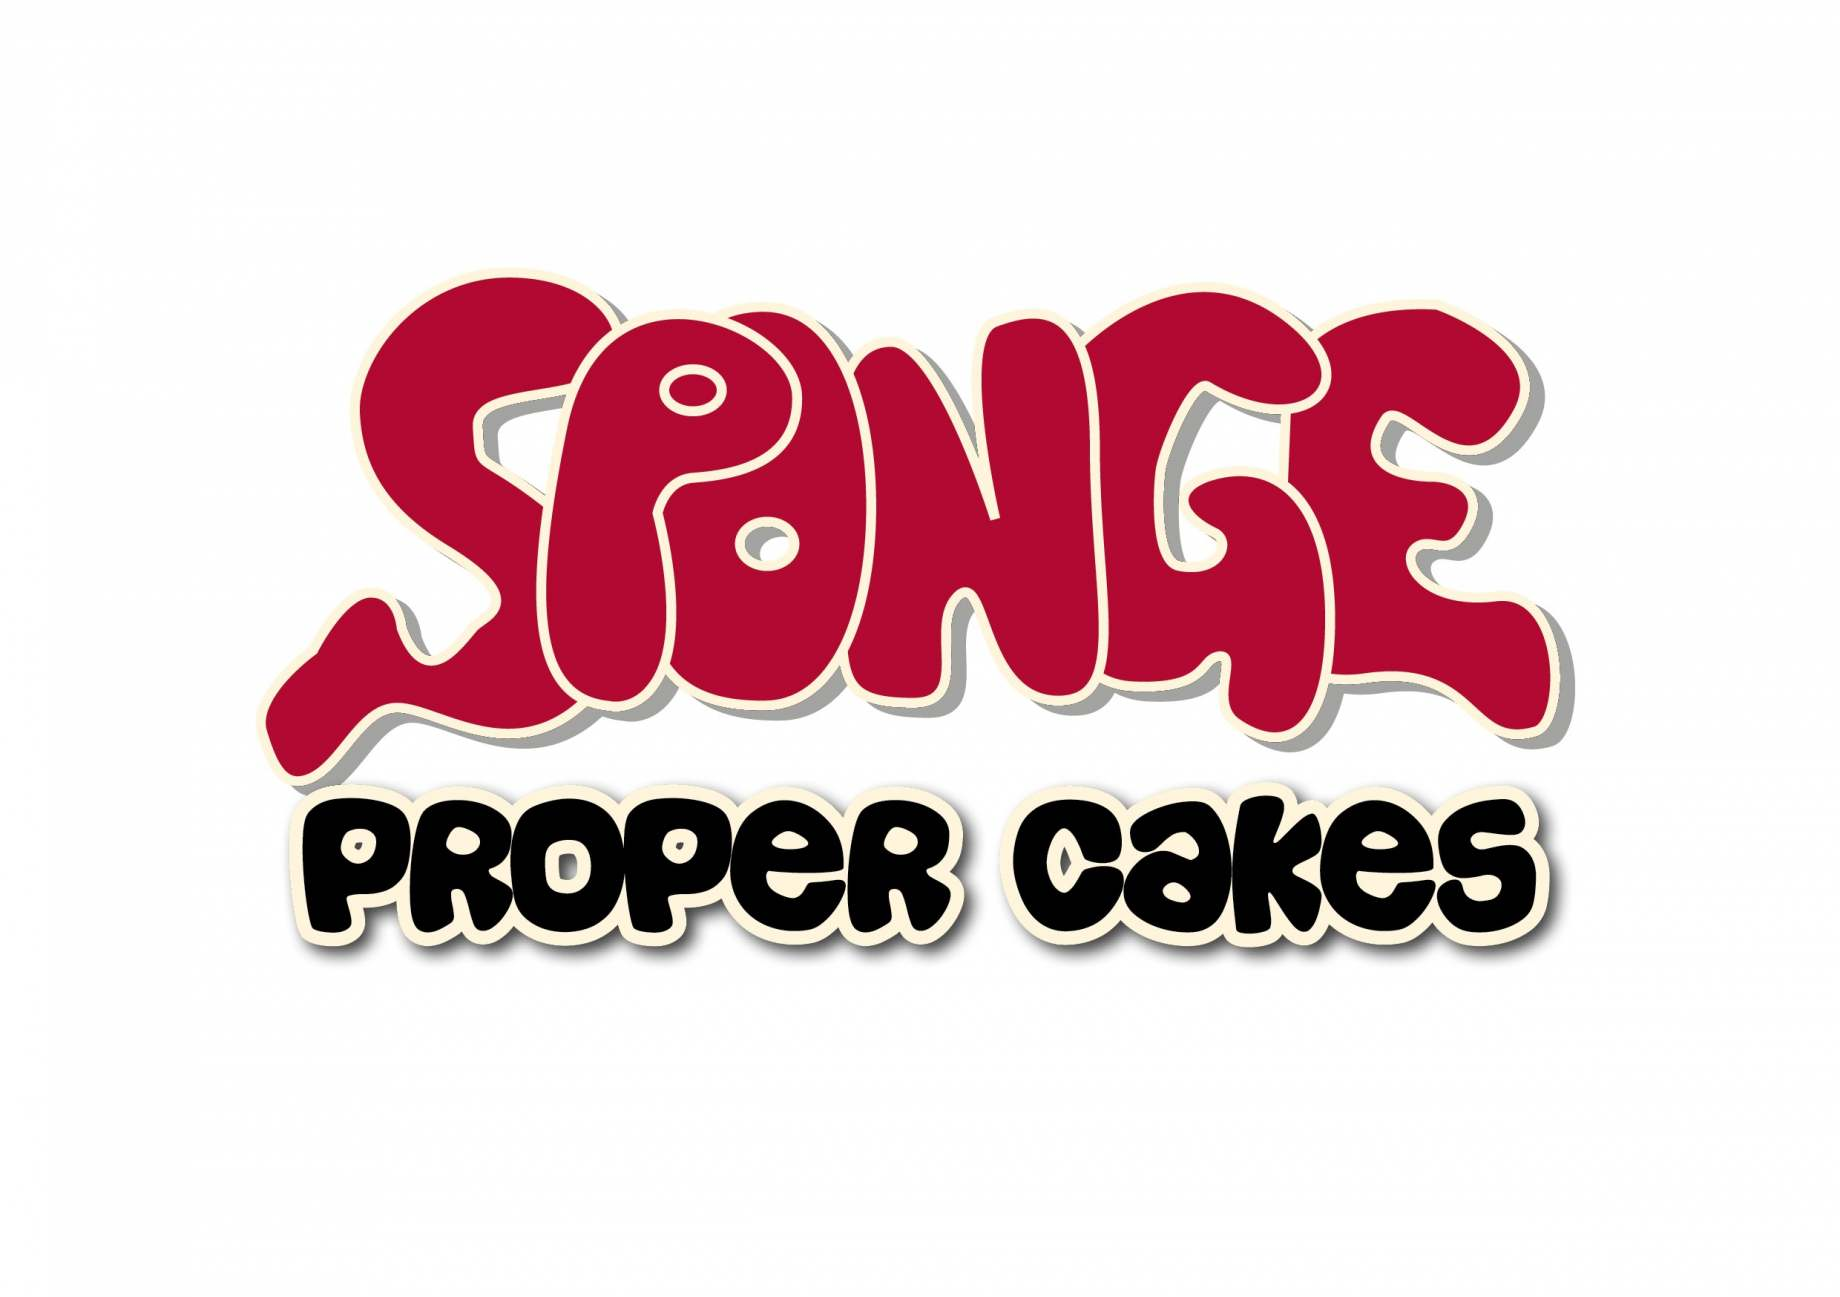 Sponge Cakes Ltd Logo